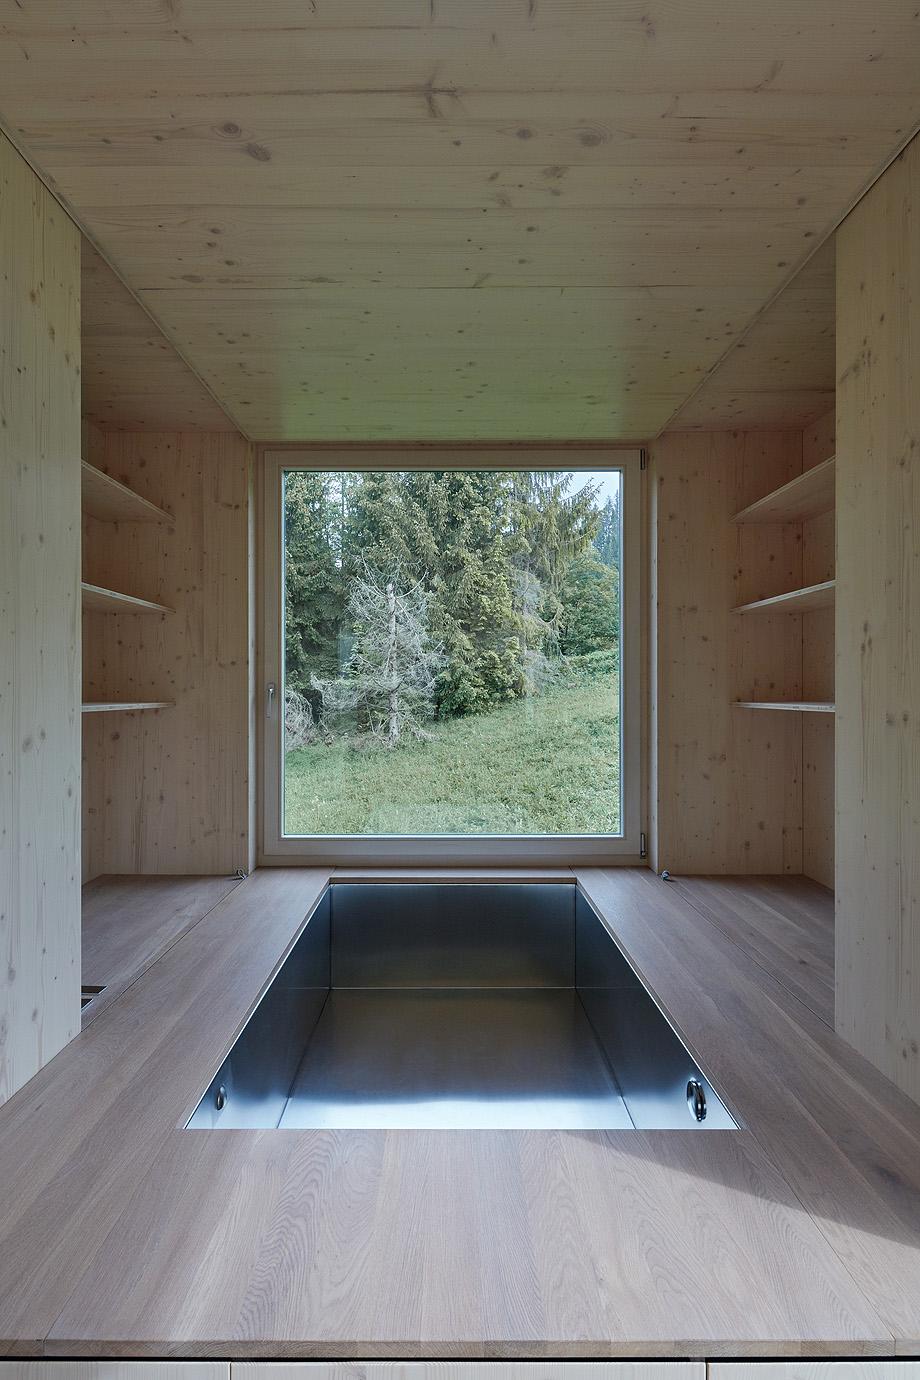 cabaña en eslovaquia de ark shelter - foto boysplaynice (15)